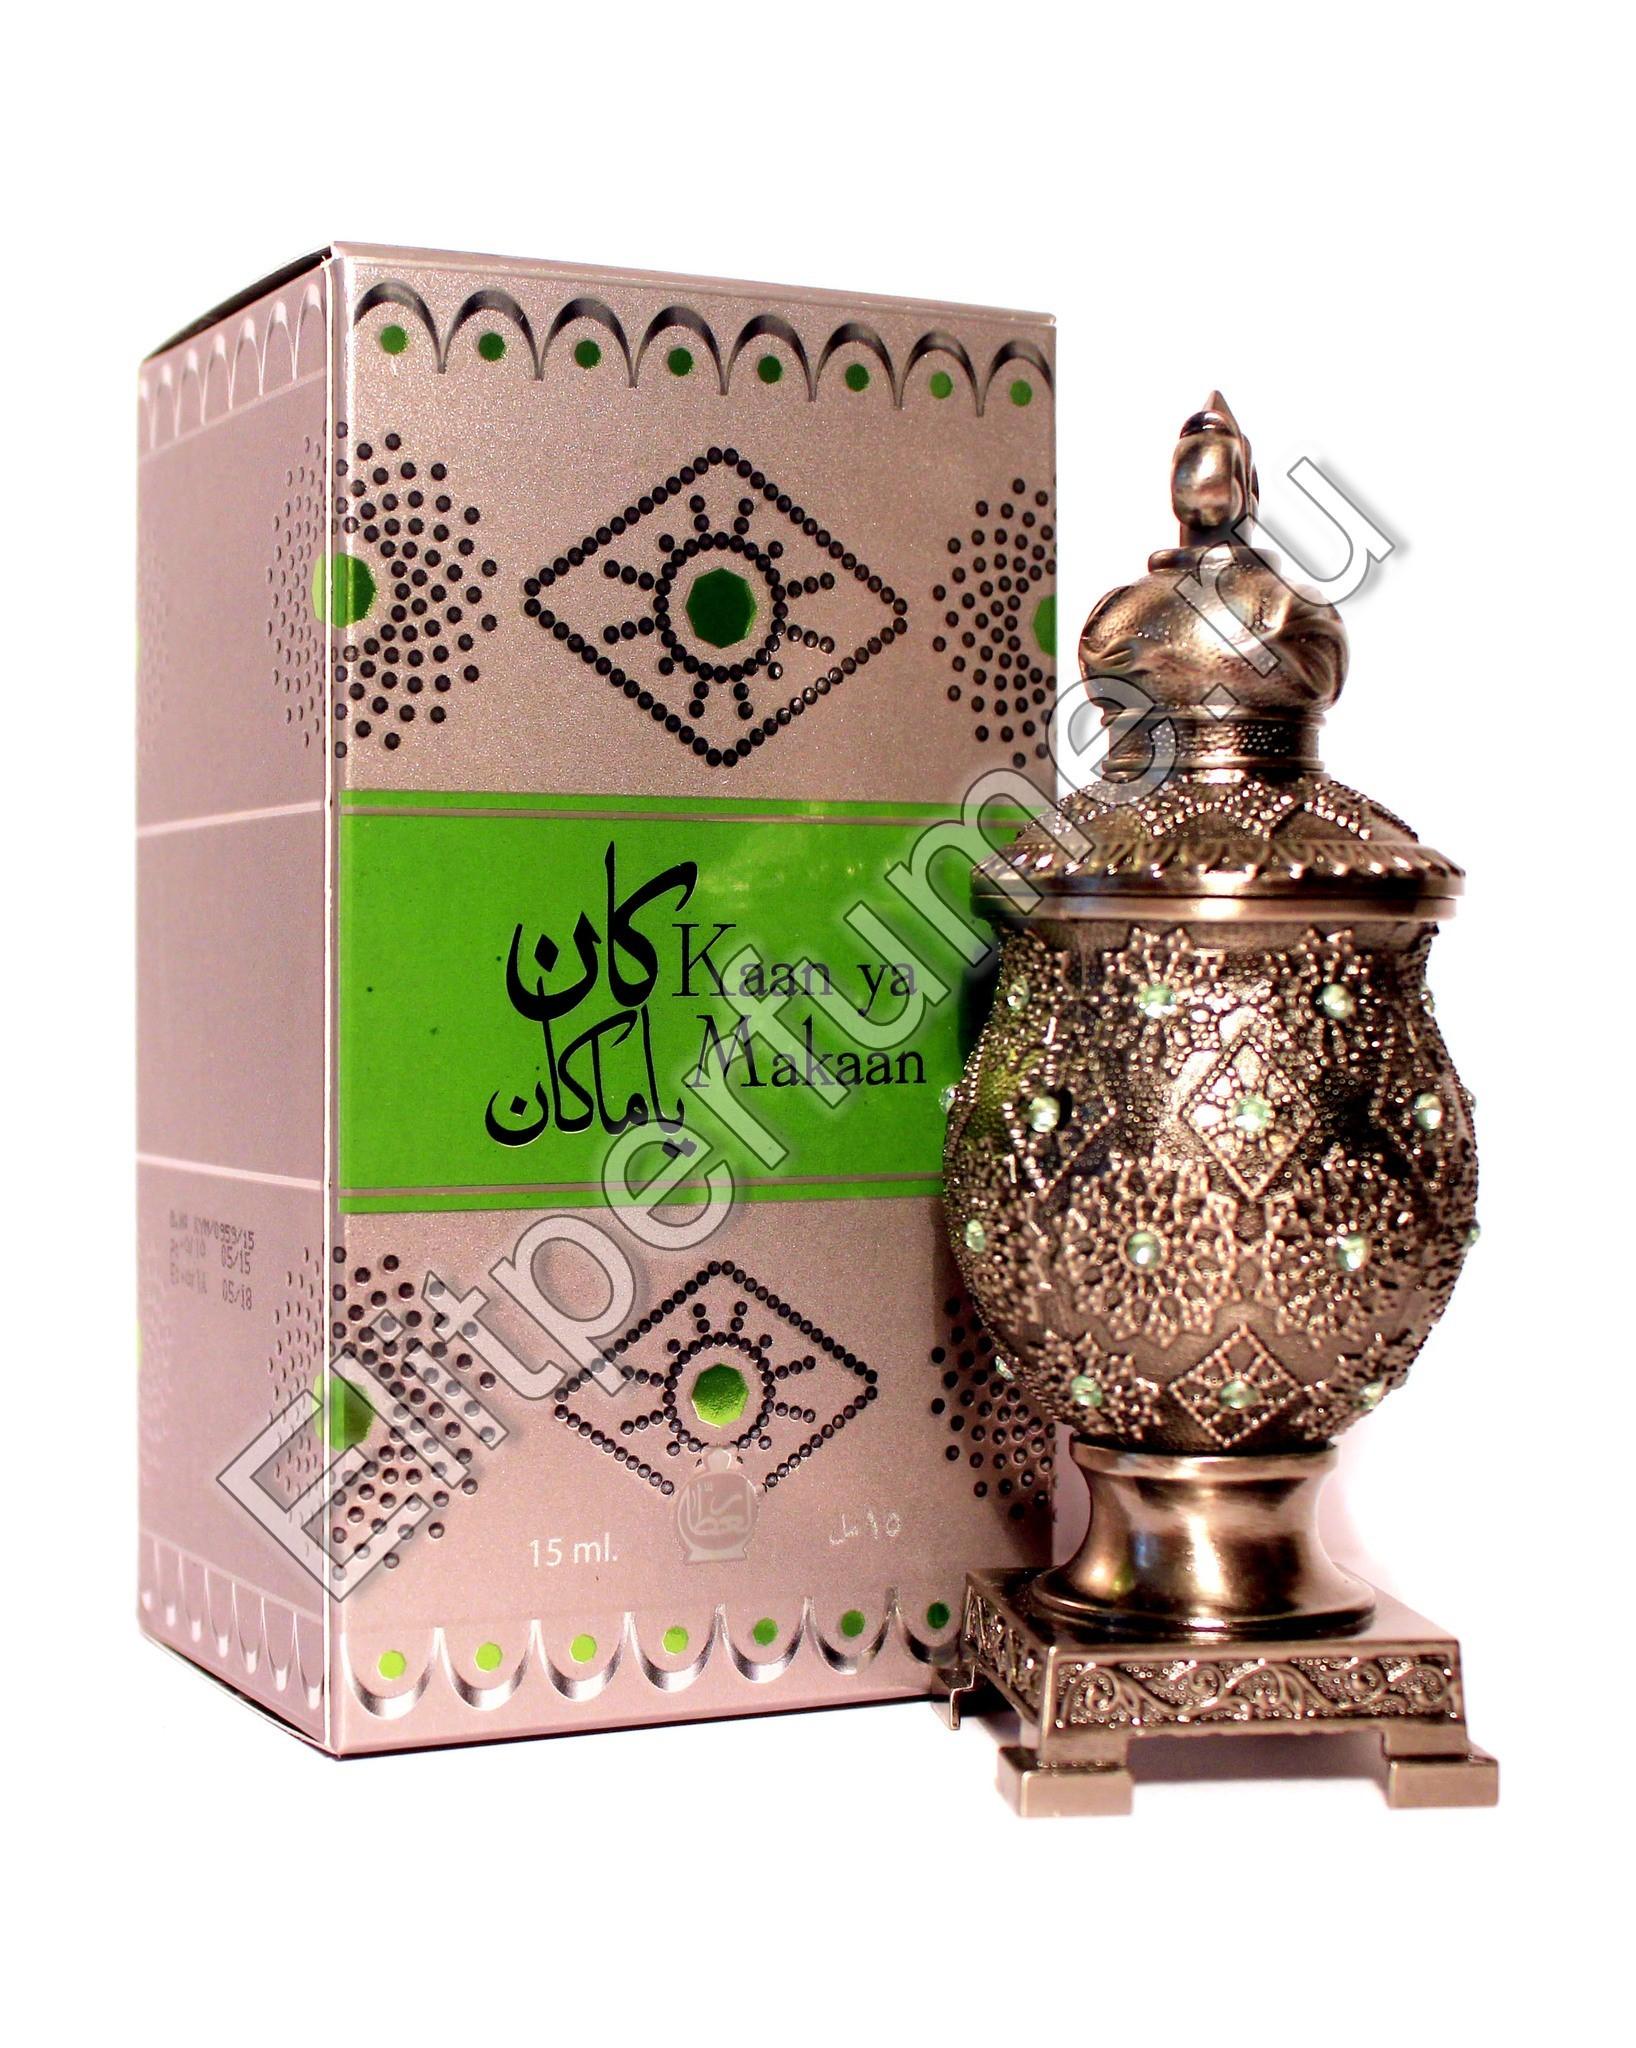 Kaan Ya Makaan Каан Я Макаан 15 мл арабские масляные духи от Афнан Парфюм Afnan Perfumes